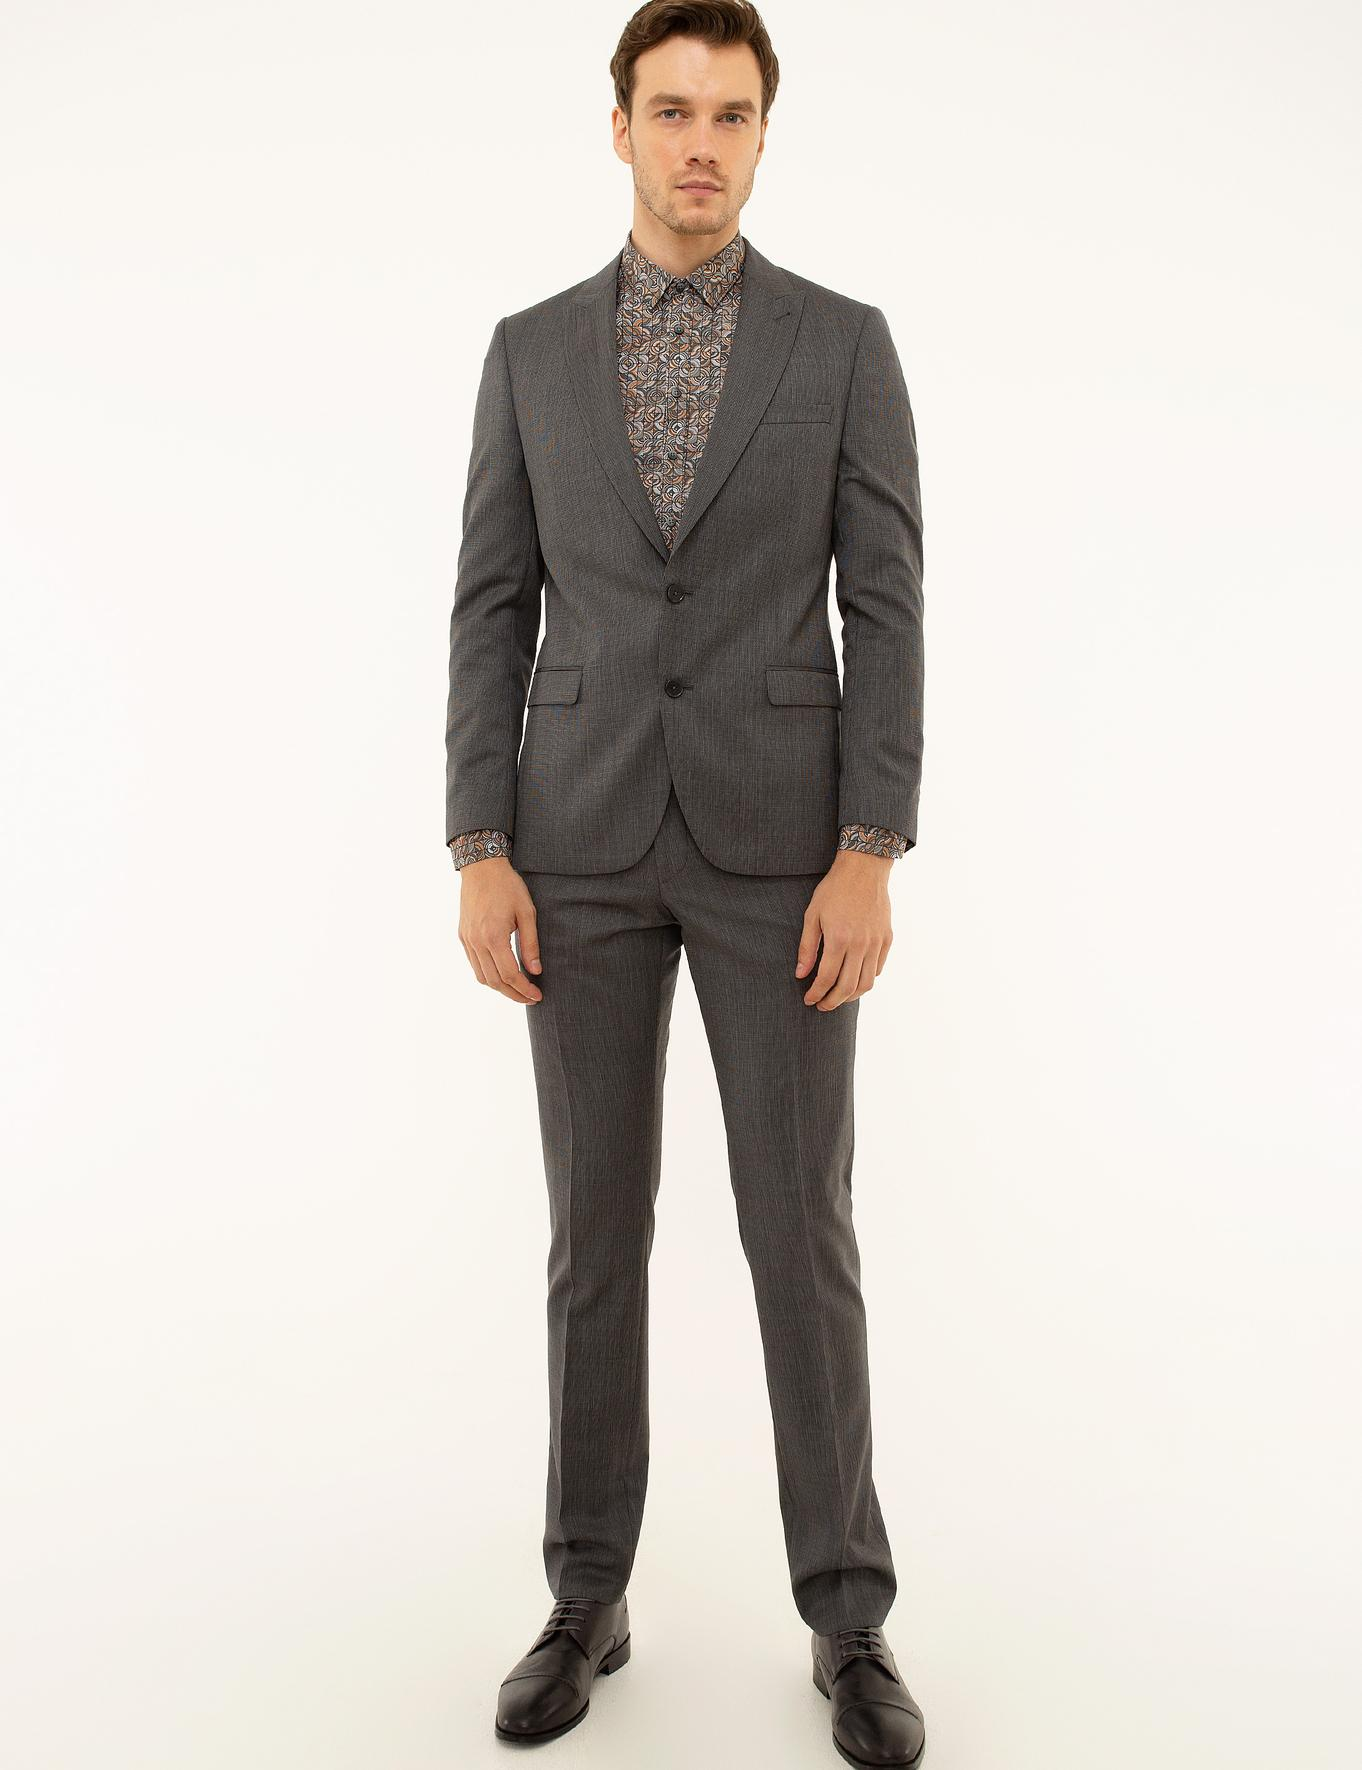 Antrasit Slim Fit Takım Elbise - 50220902005